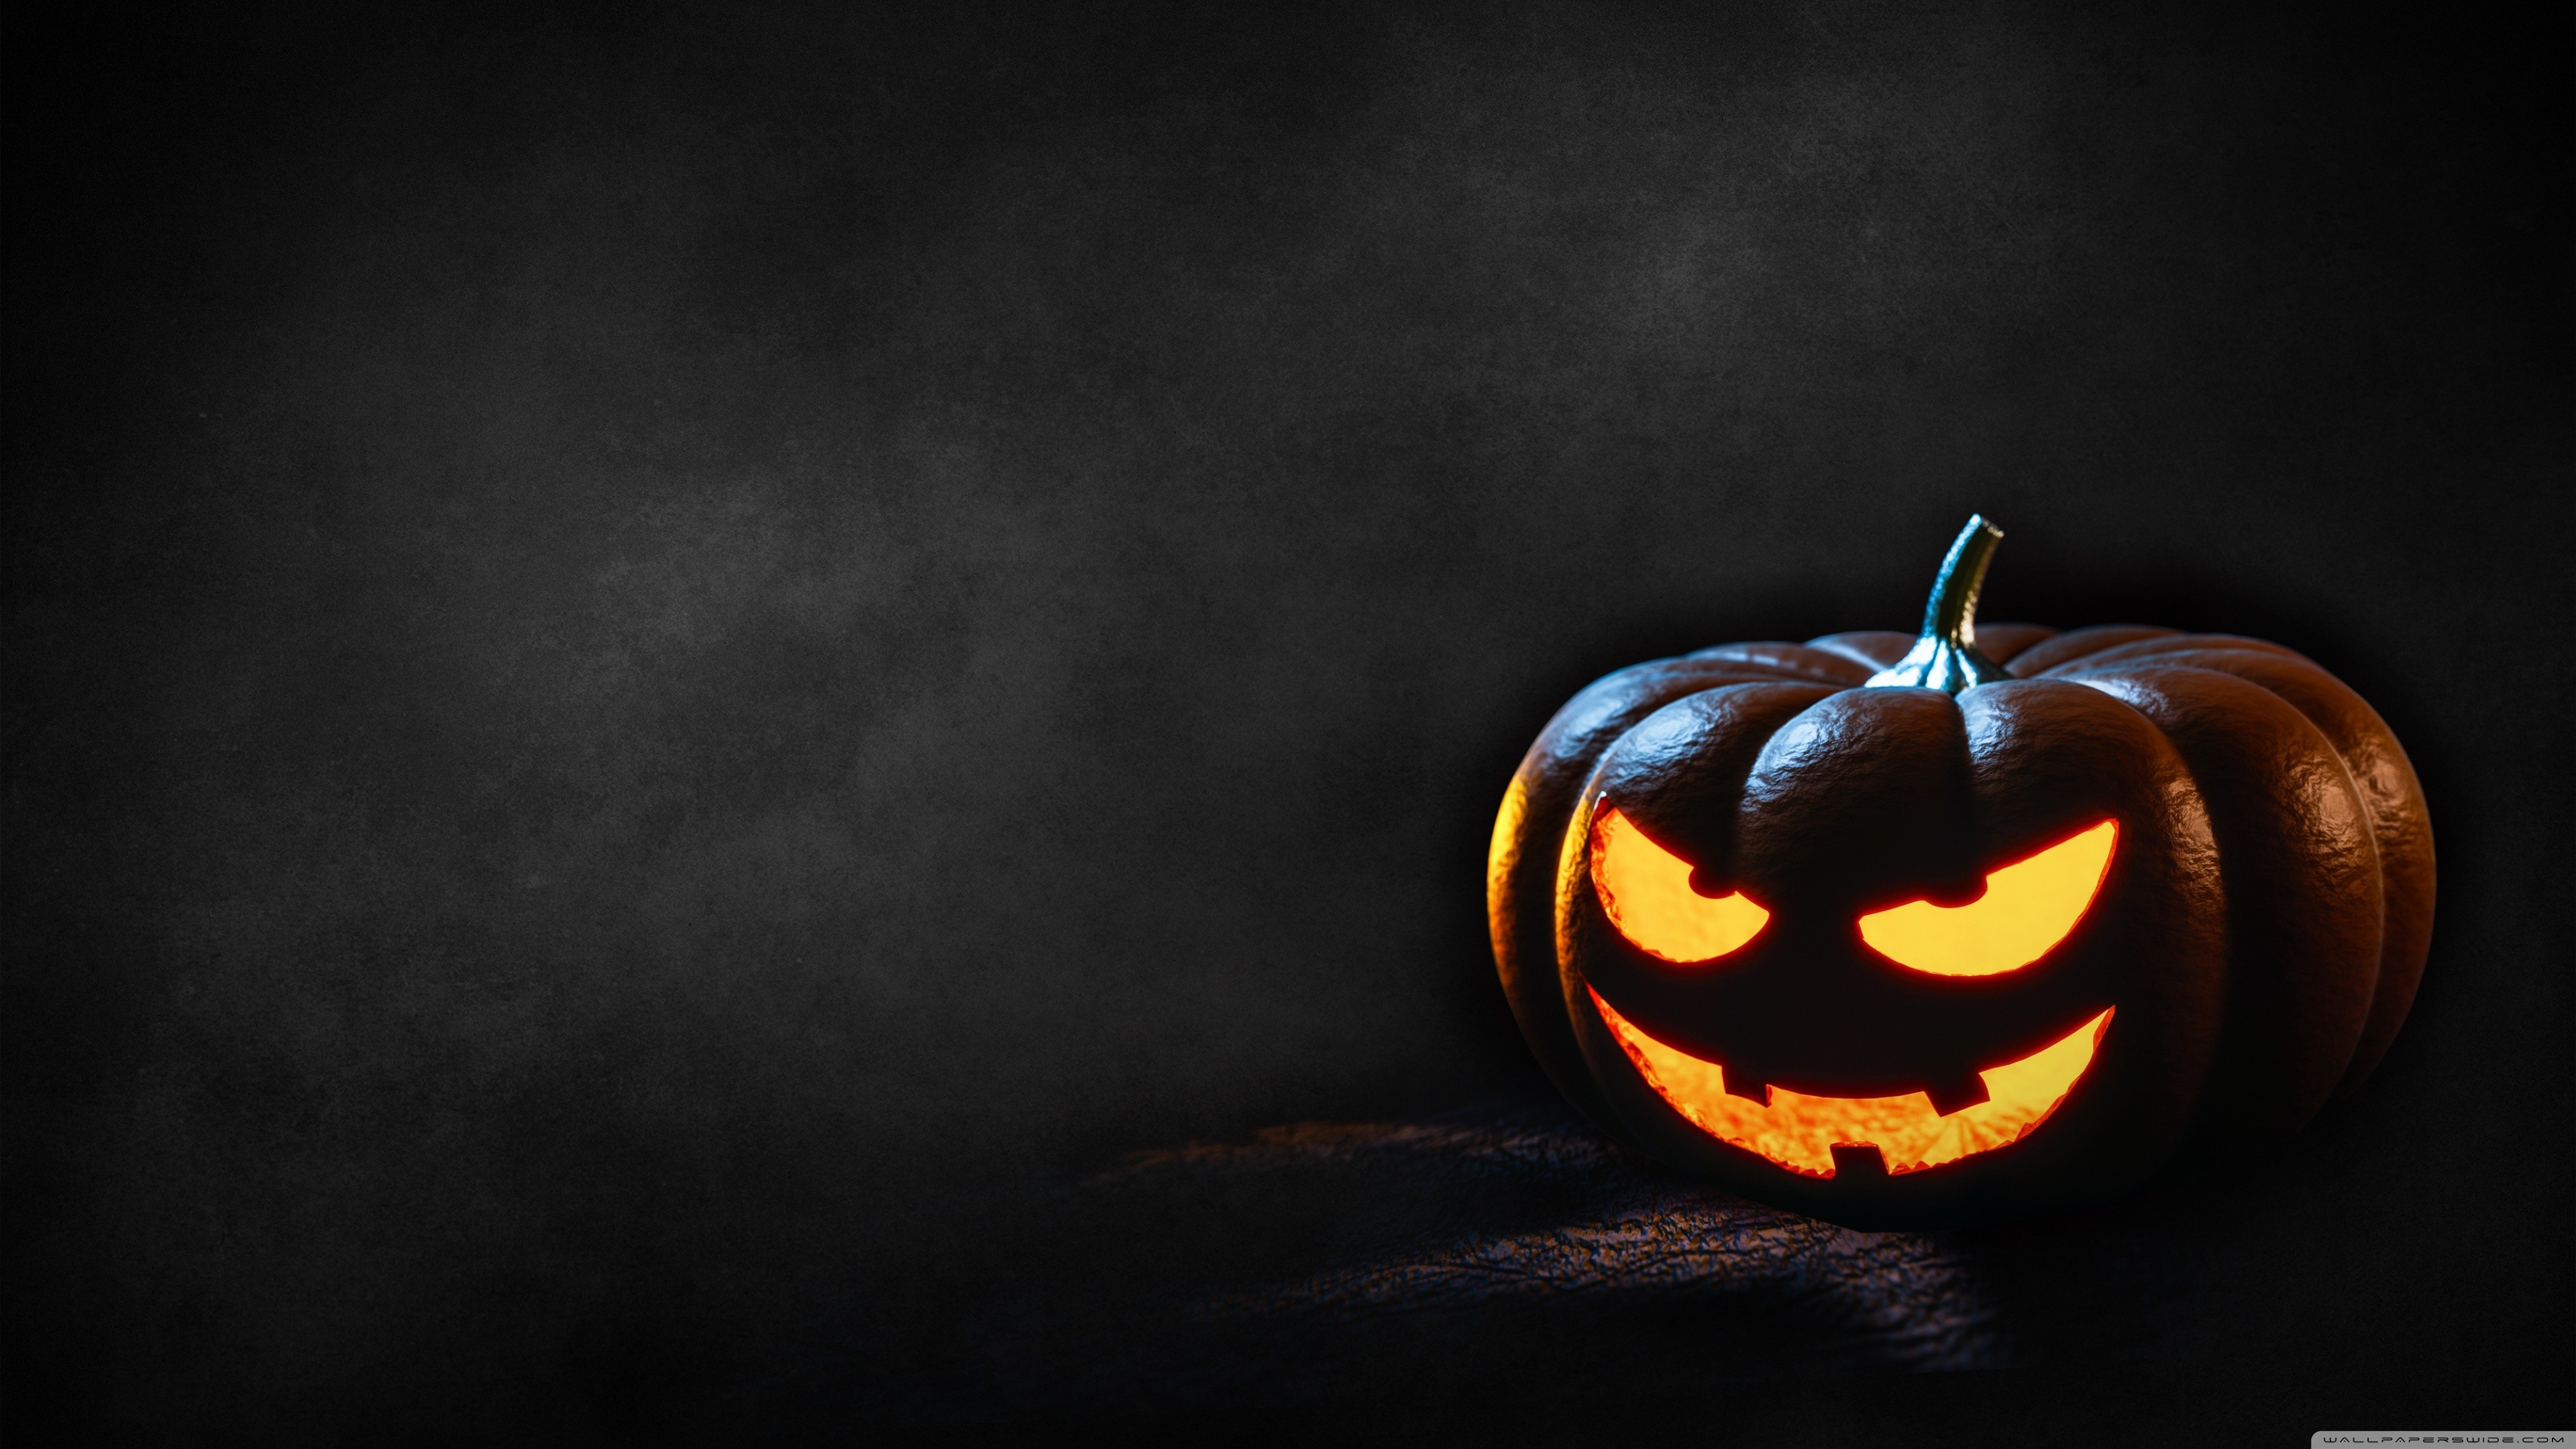 Happy Halloween 2016 HD Wide Wallpaper for Widescreen